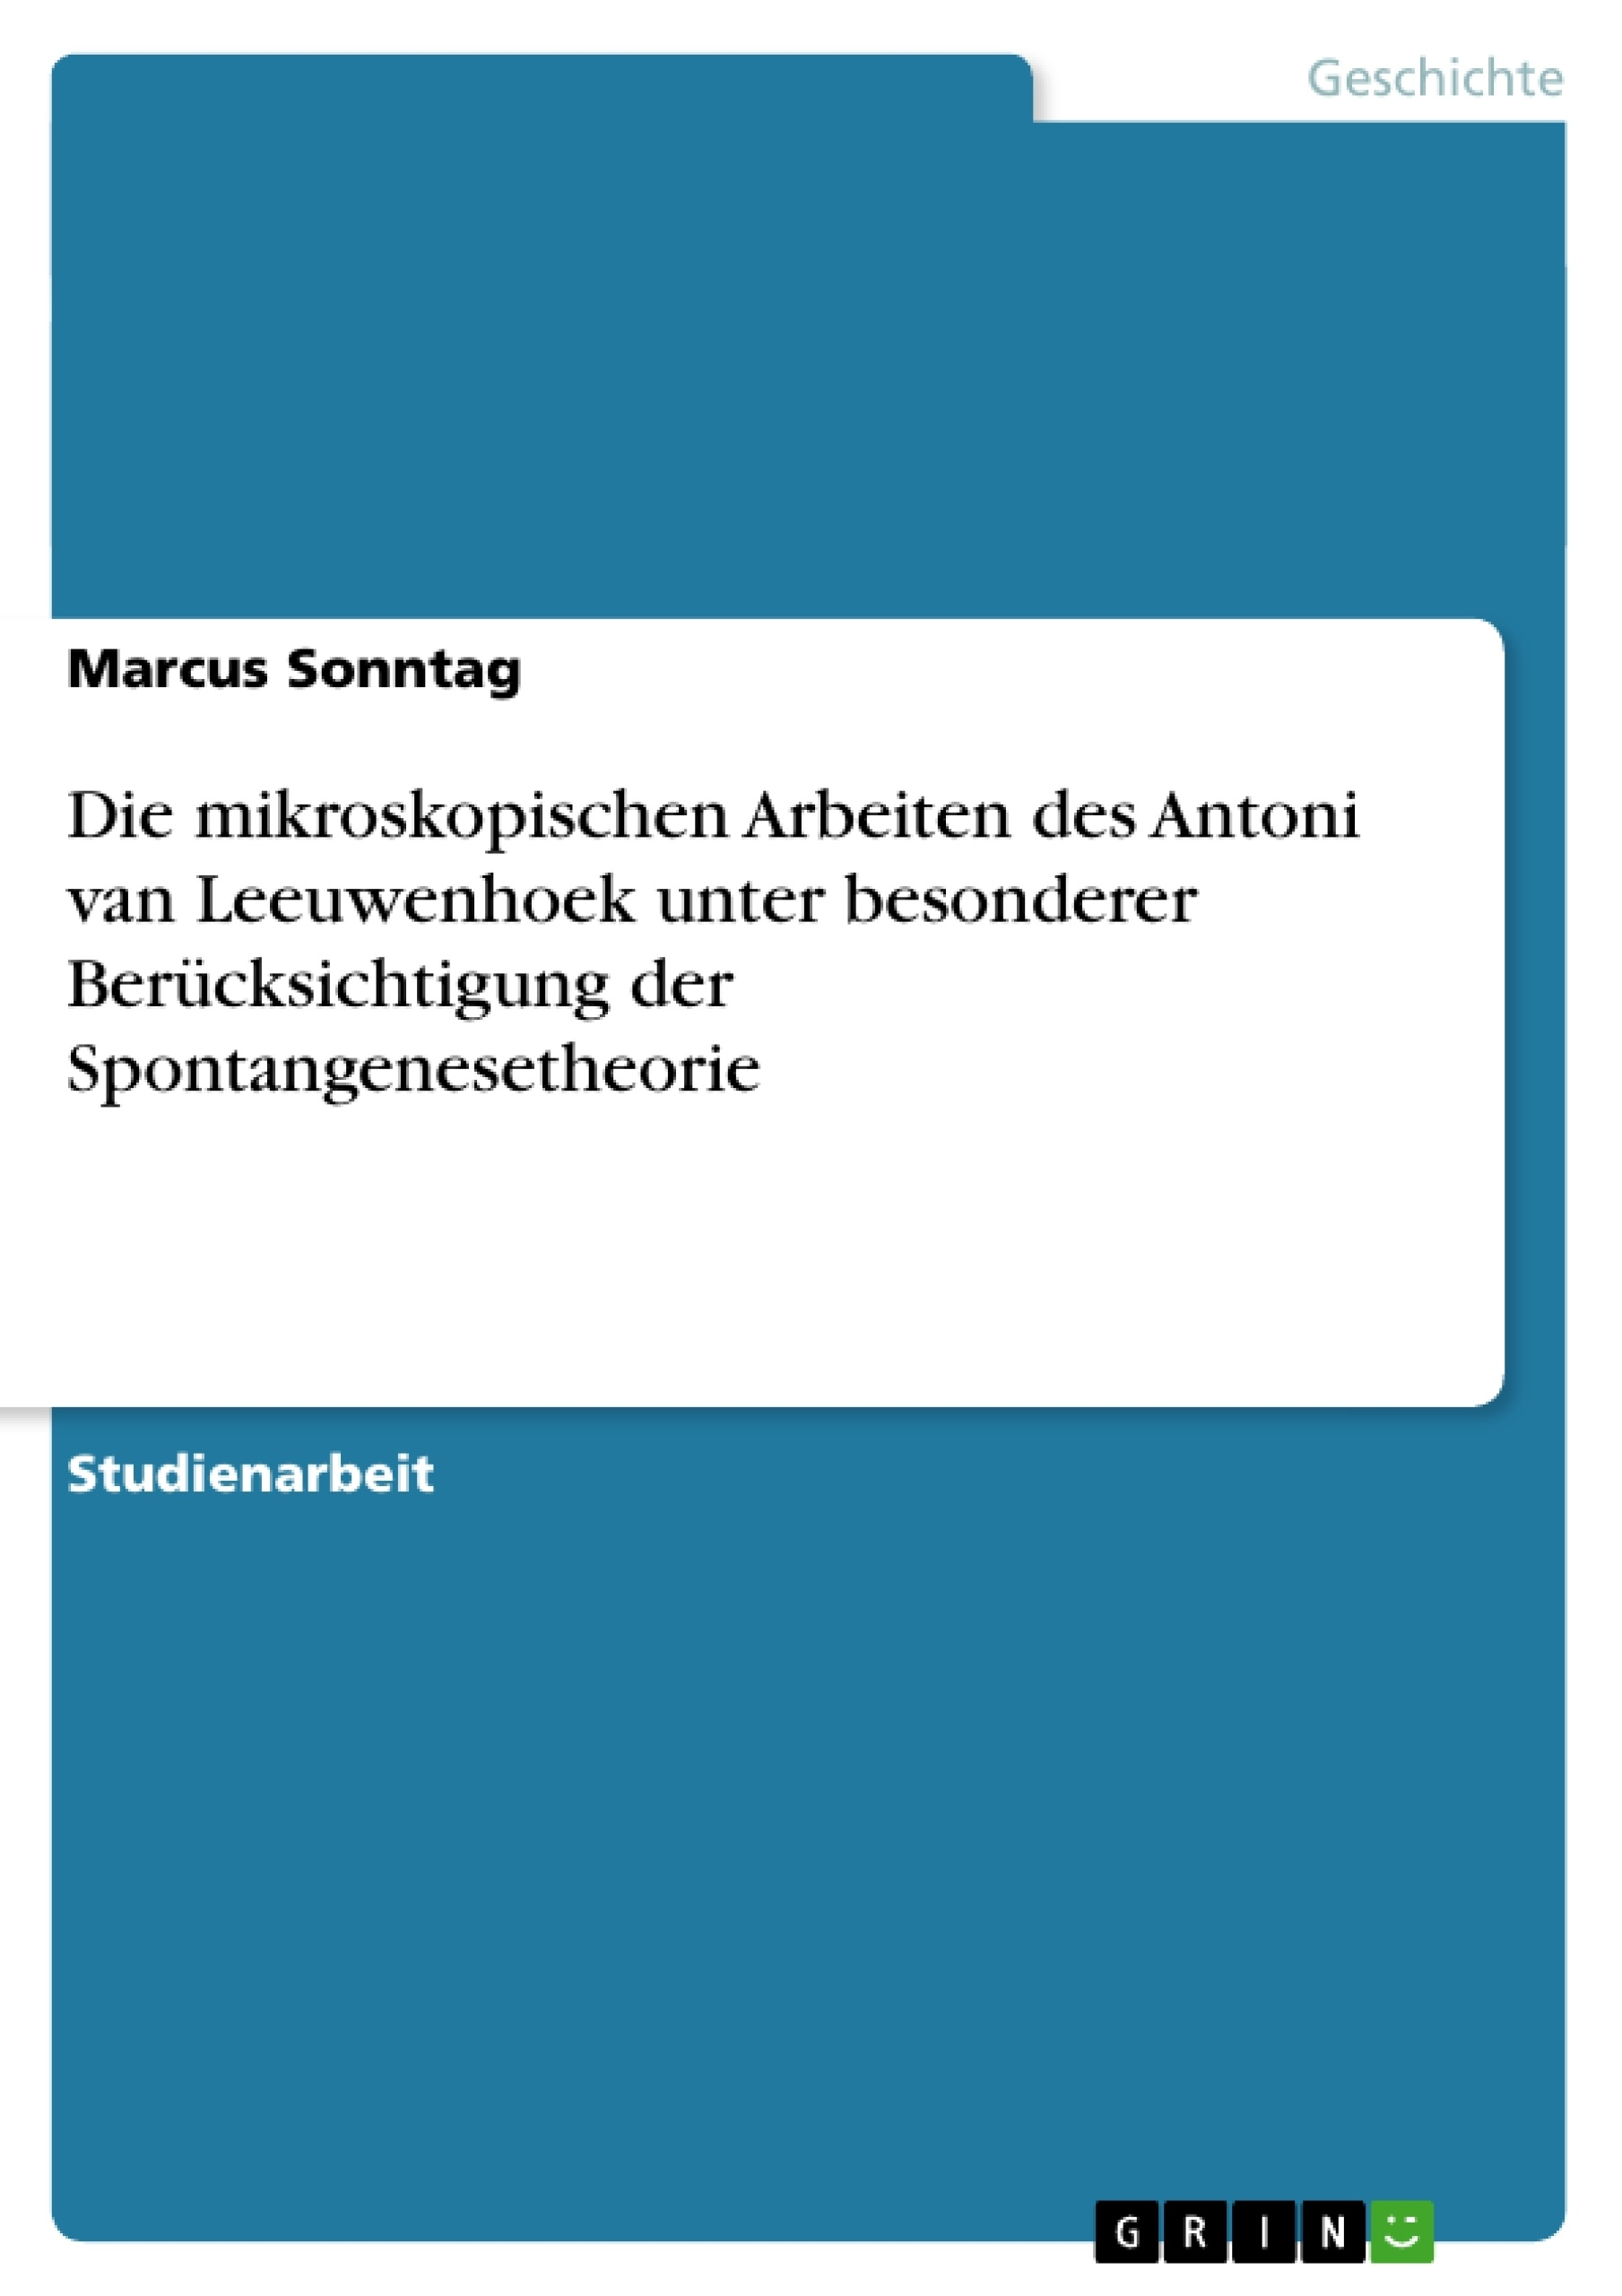 Titel: Die mikroskopischen Arbeiten des Antoni van Leeuwenhoek unter besonderer Berücksichtigung der Spontangenesetheorie